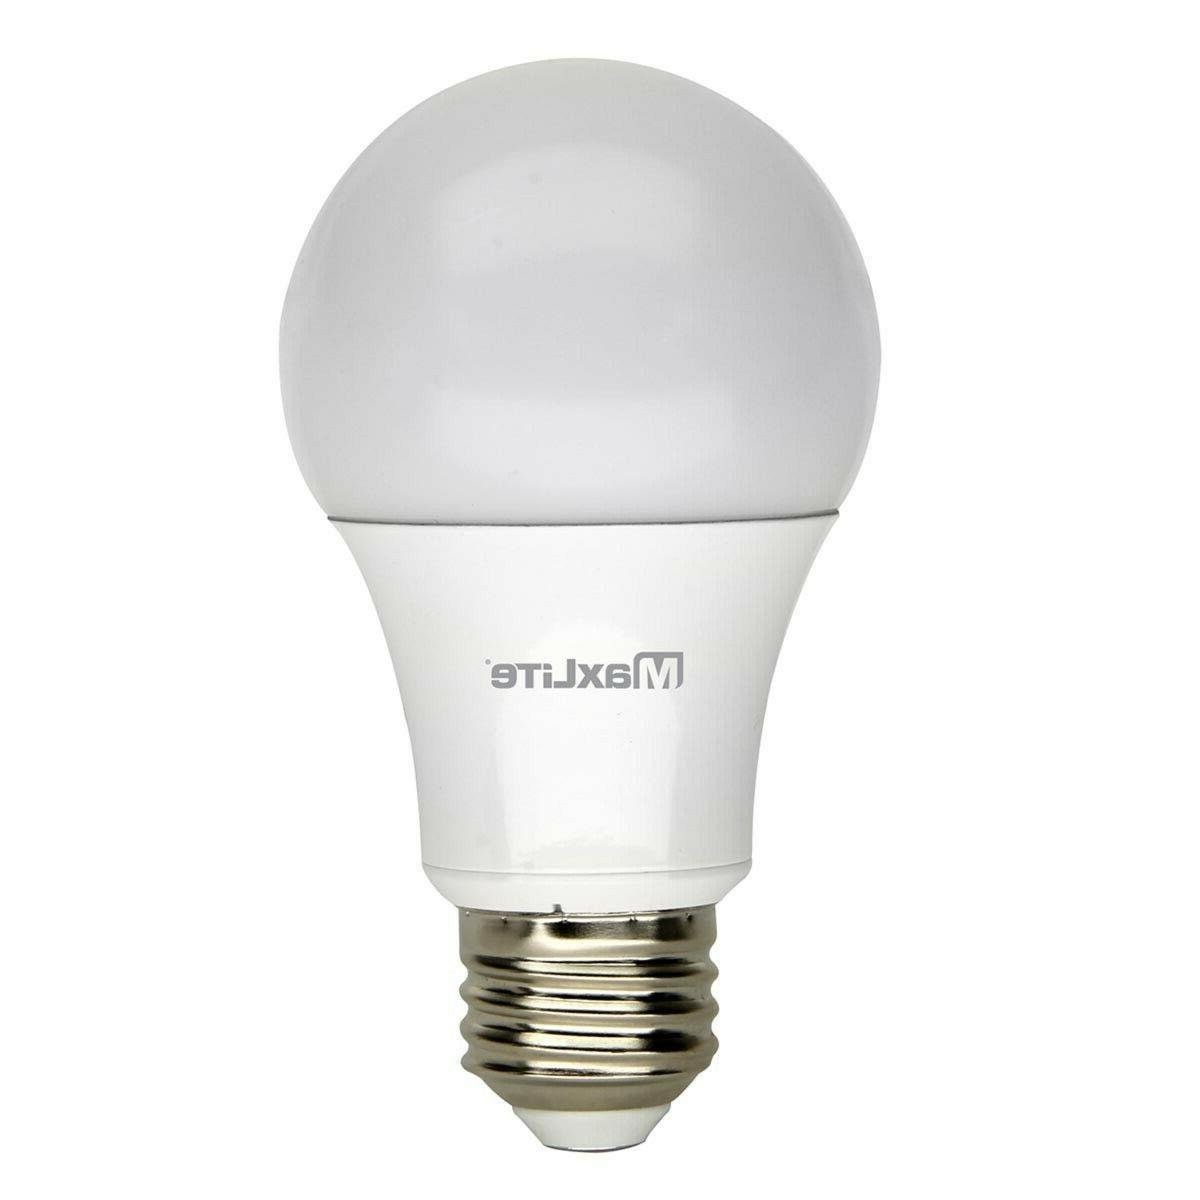 LED Daylight Dimmable Bulb 100 Equivalent 5000k Maxlite